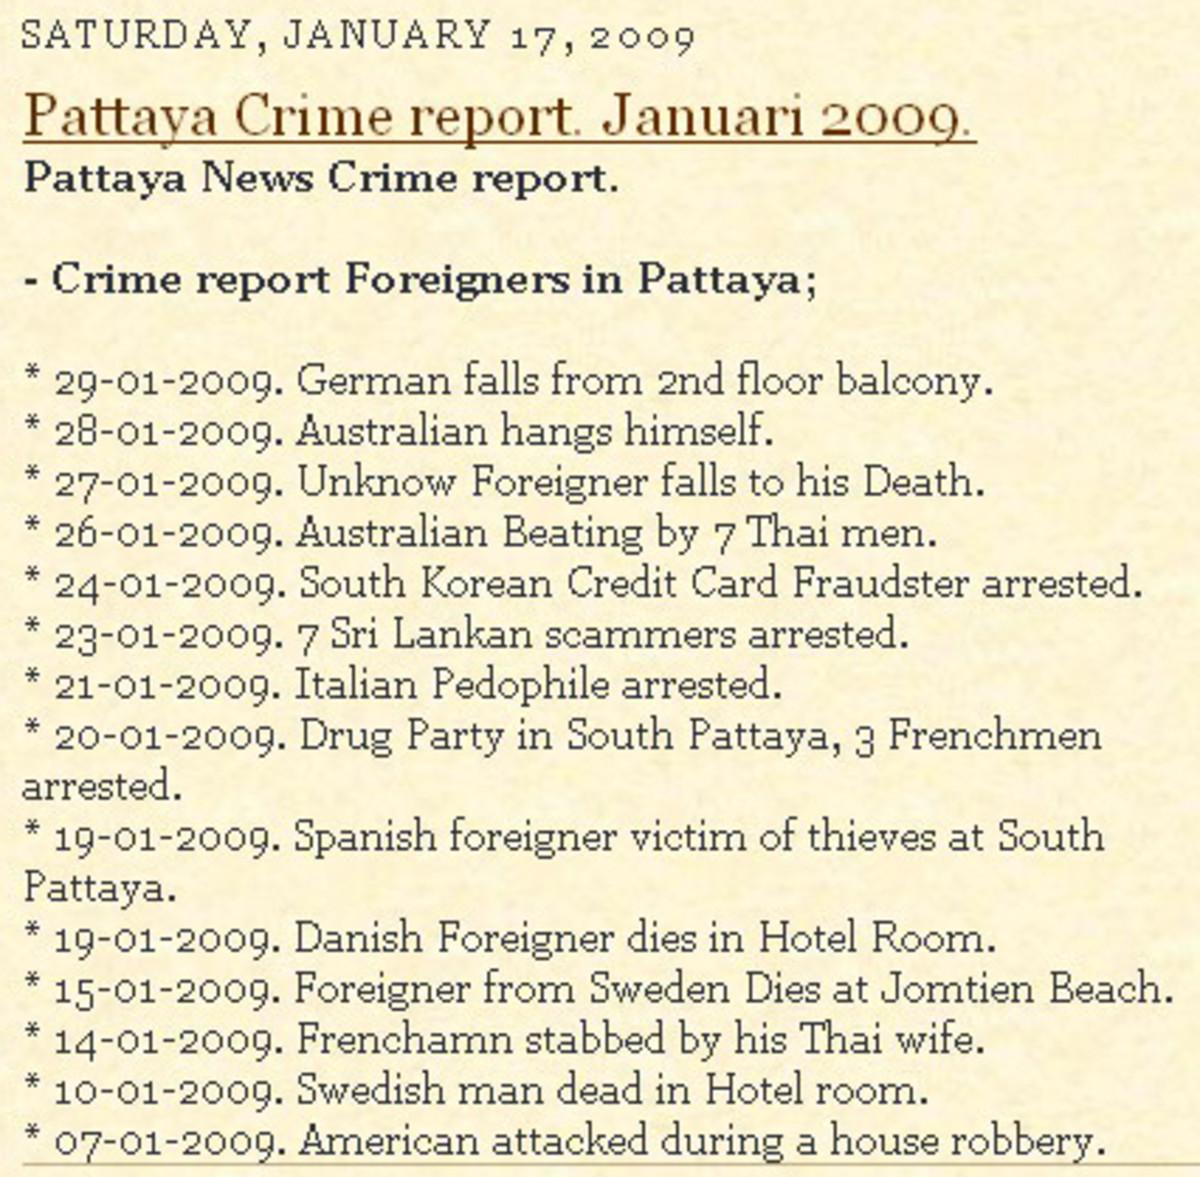 http://holidaypattaya.blogspot.com/2009/01/pattaya-news-1-15-januari-2009-crime.html Pattaya is notrious for crime.